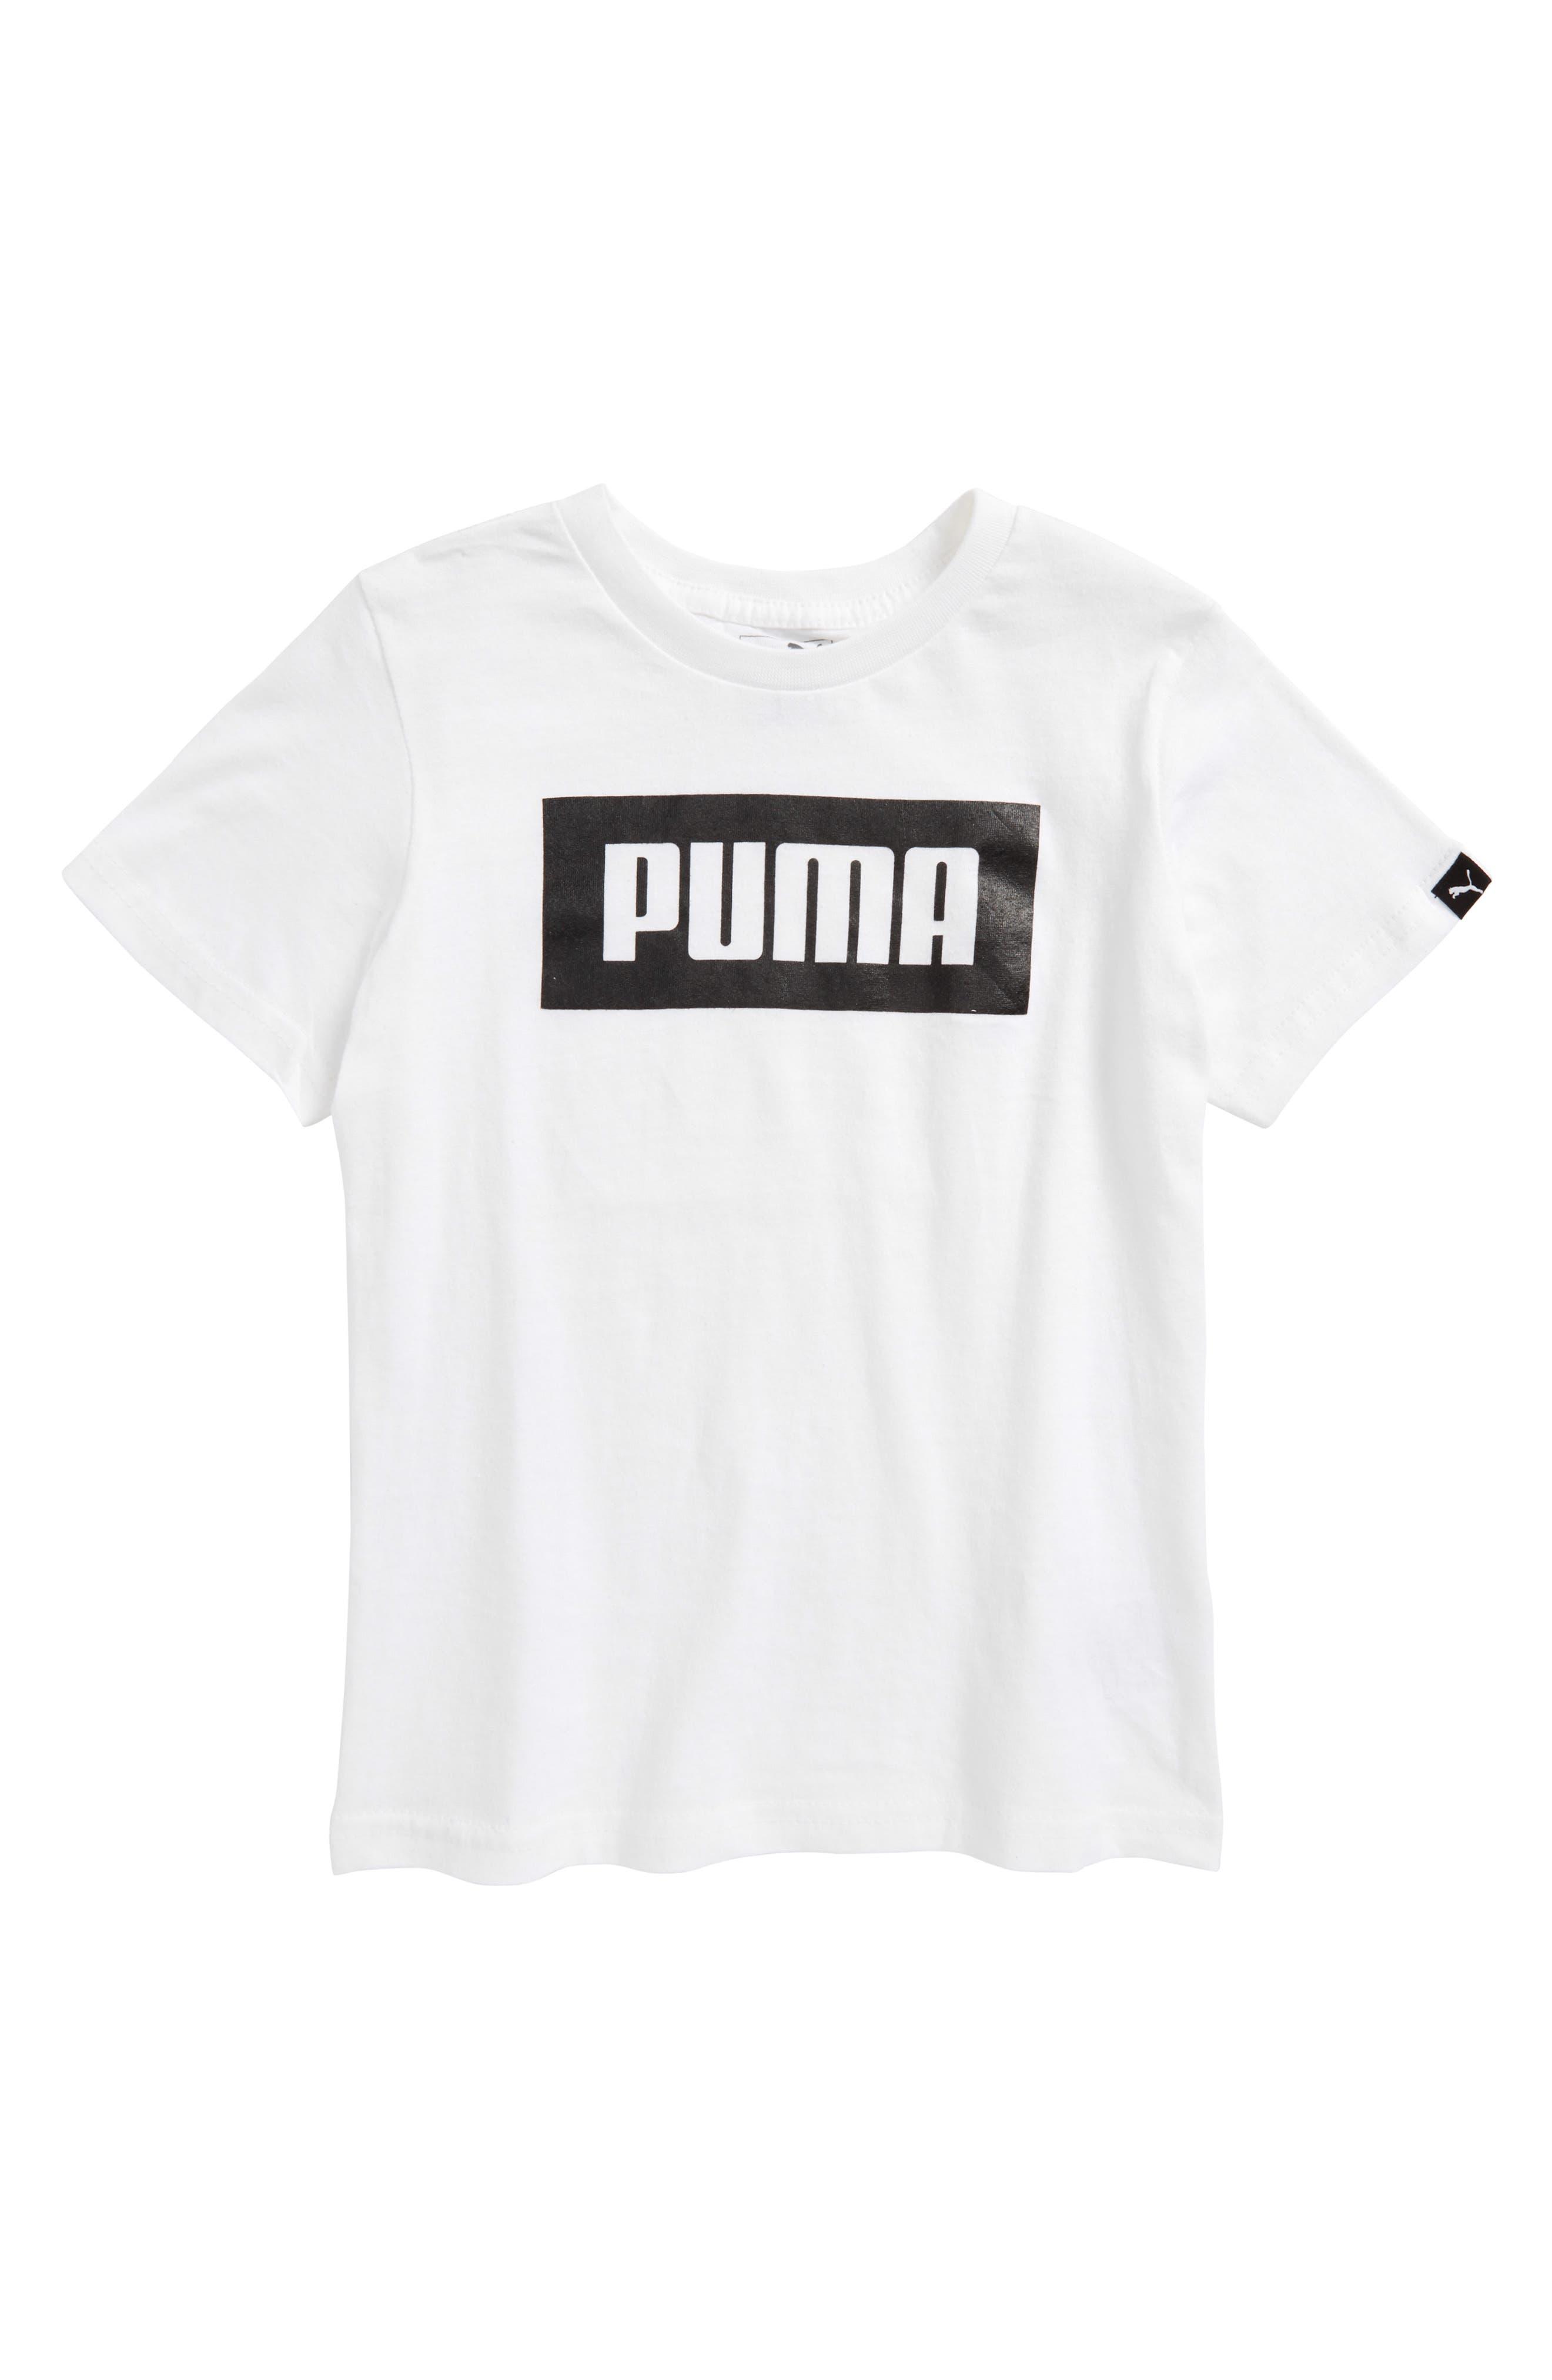 PUMA Rebel Graphic T-Shirt (Little Boys)